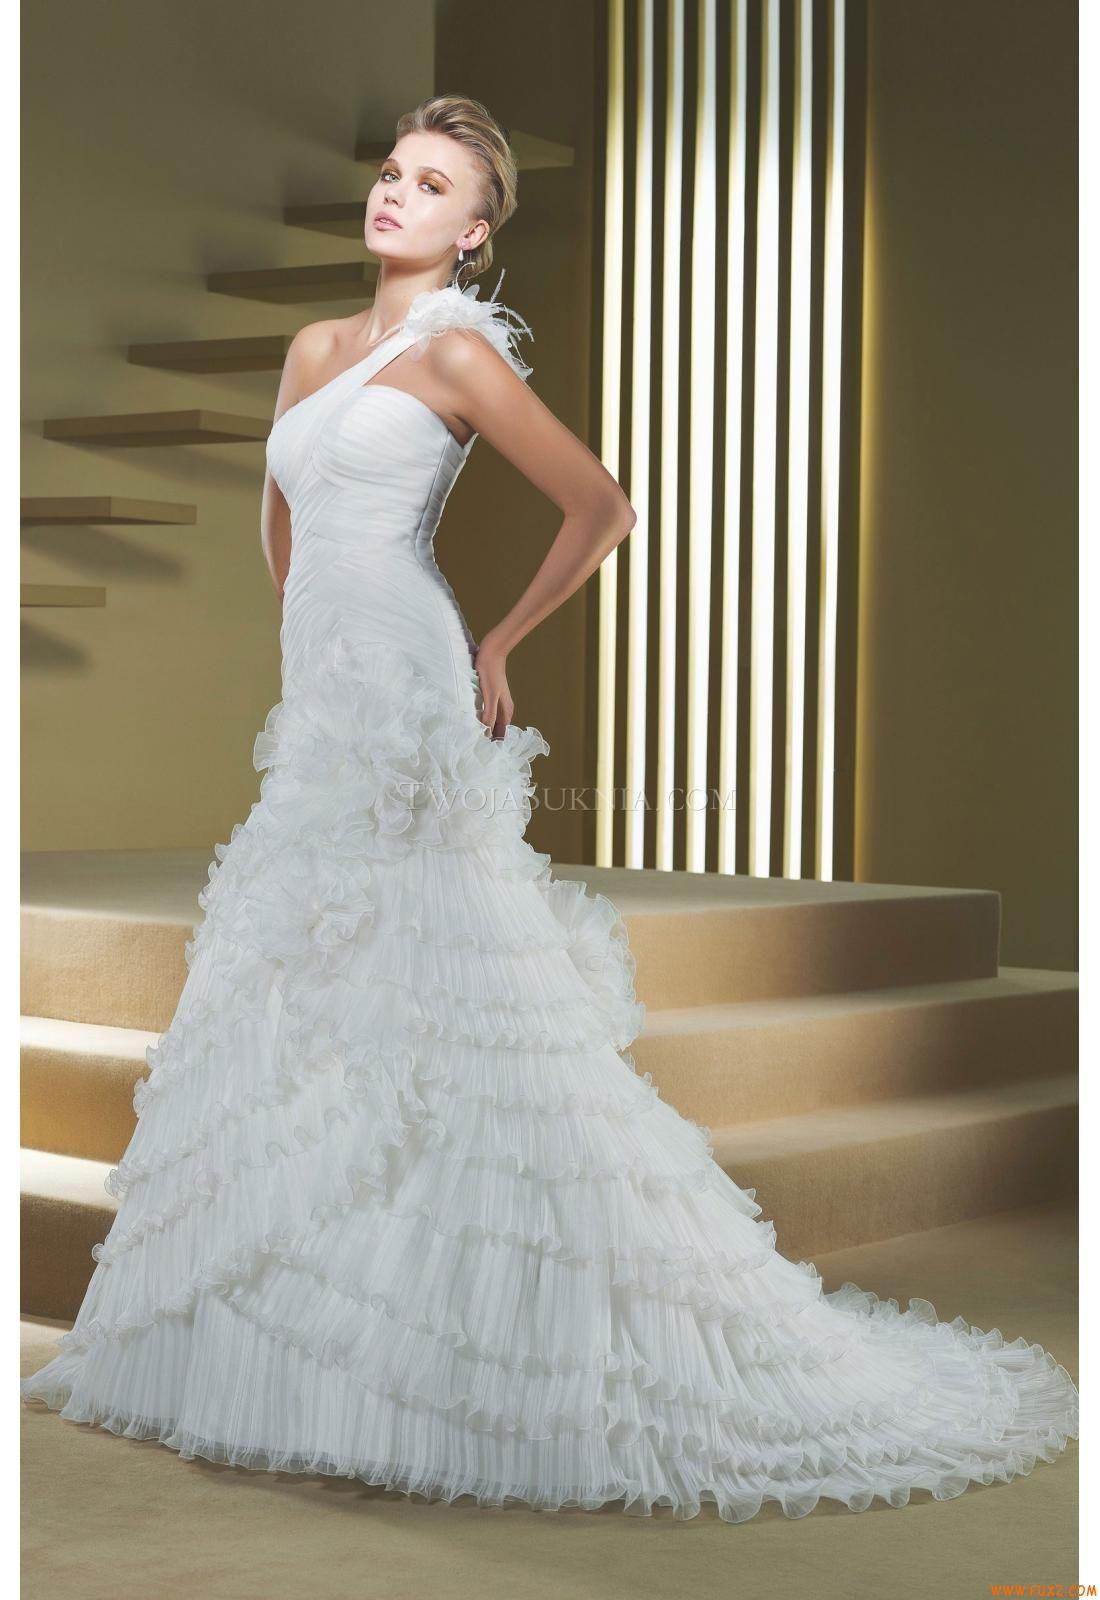 Wedding Dresses Elianna Moore EL1159 2013